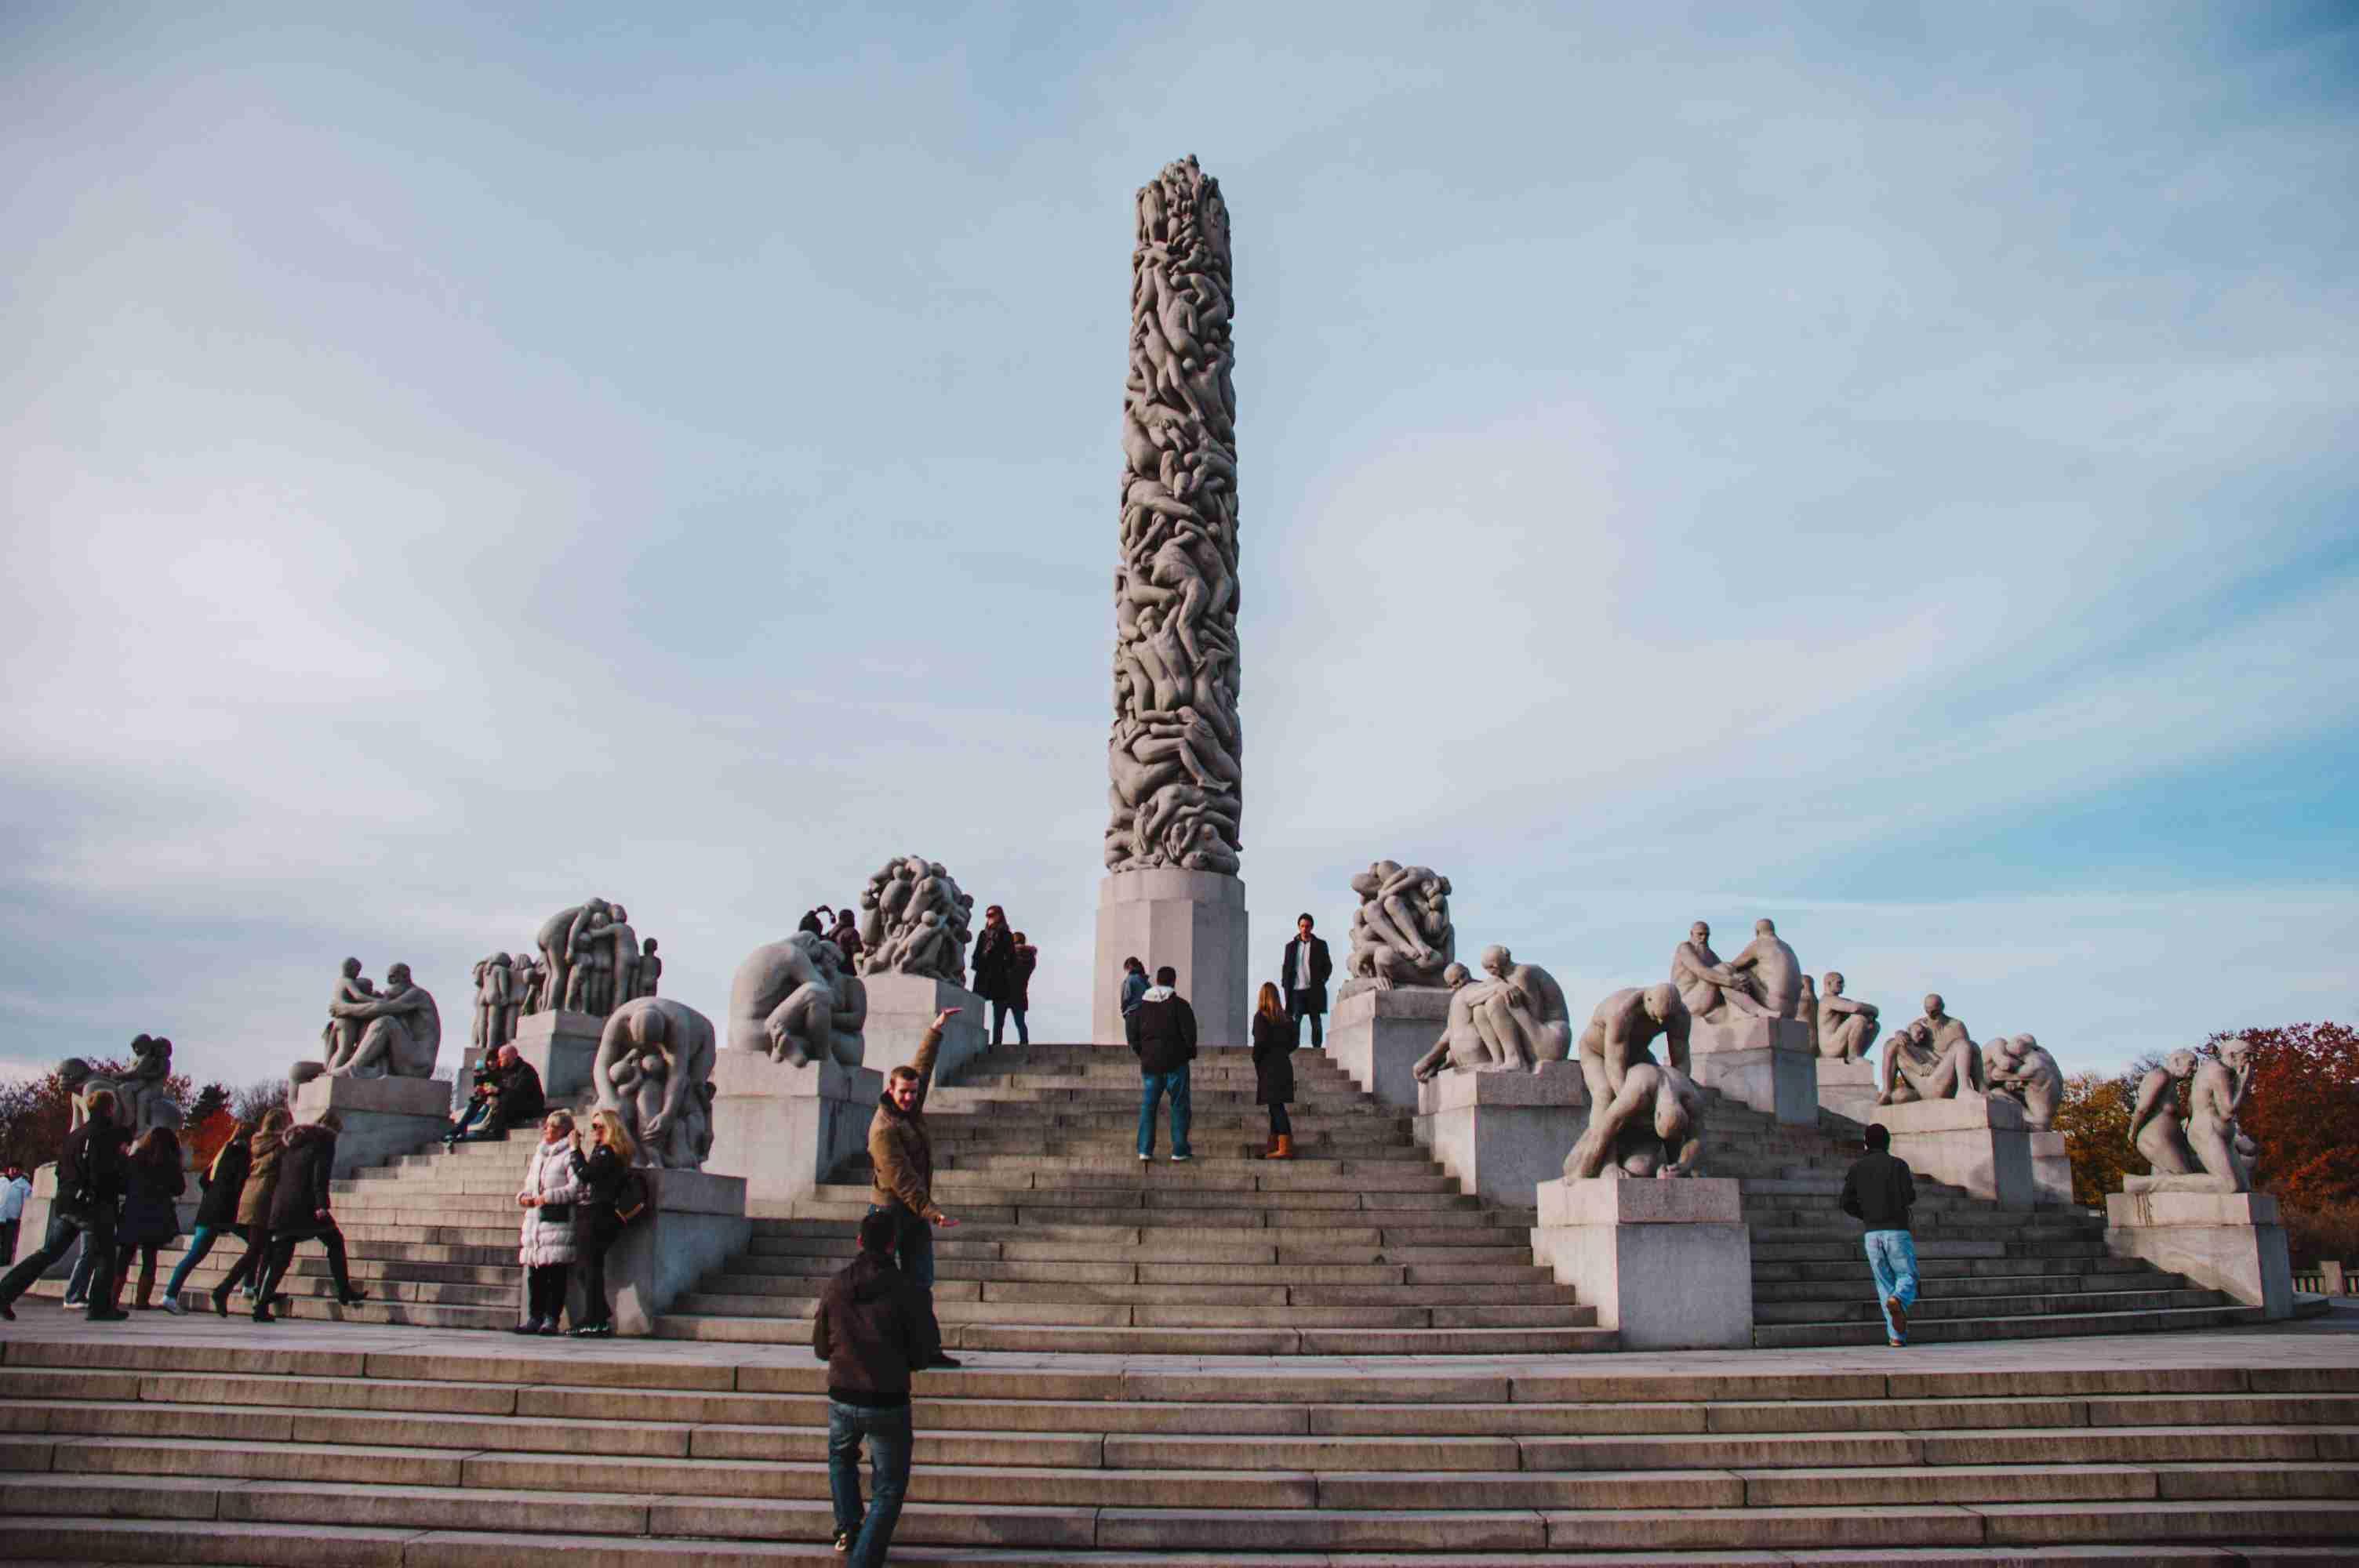 Sculpture Garden in Oslo